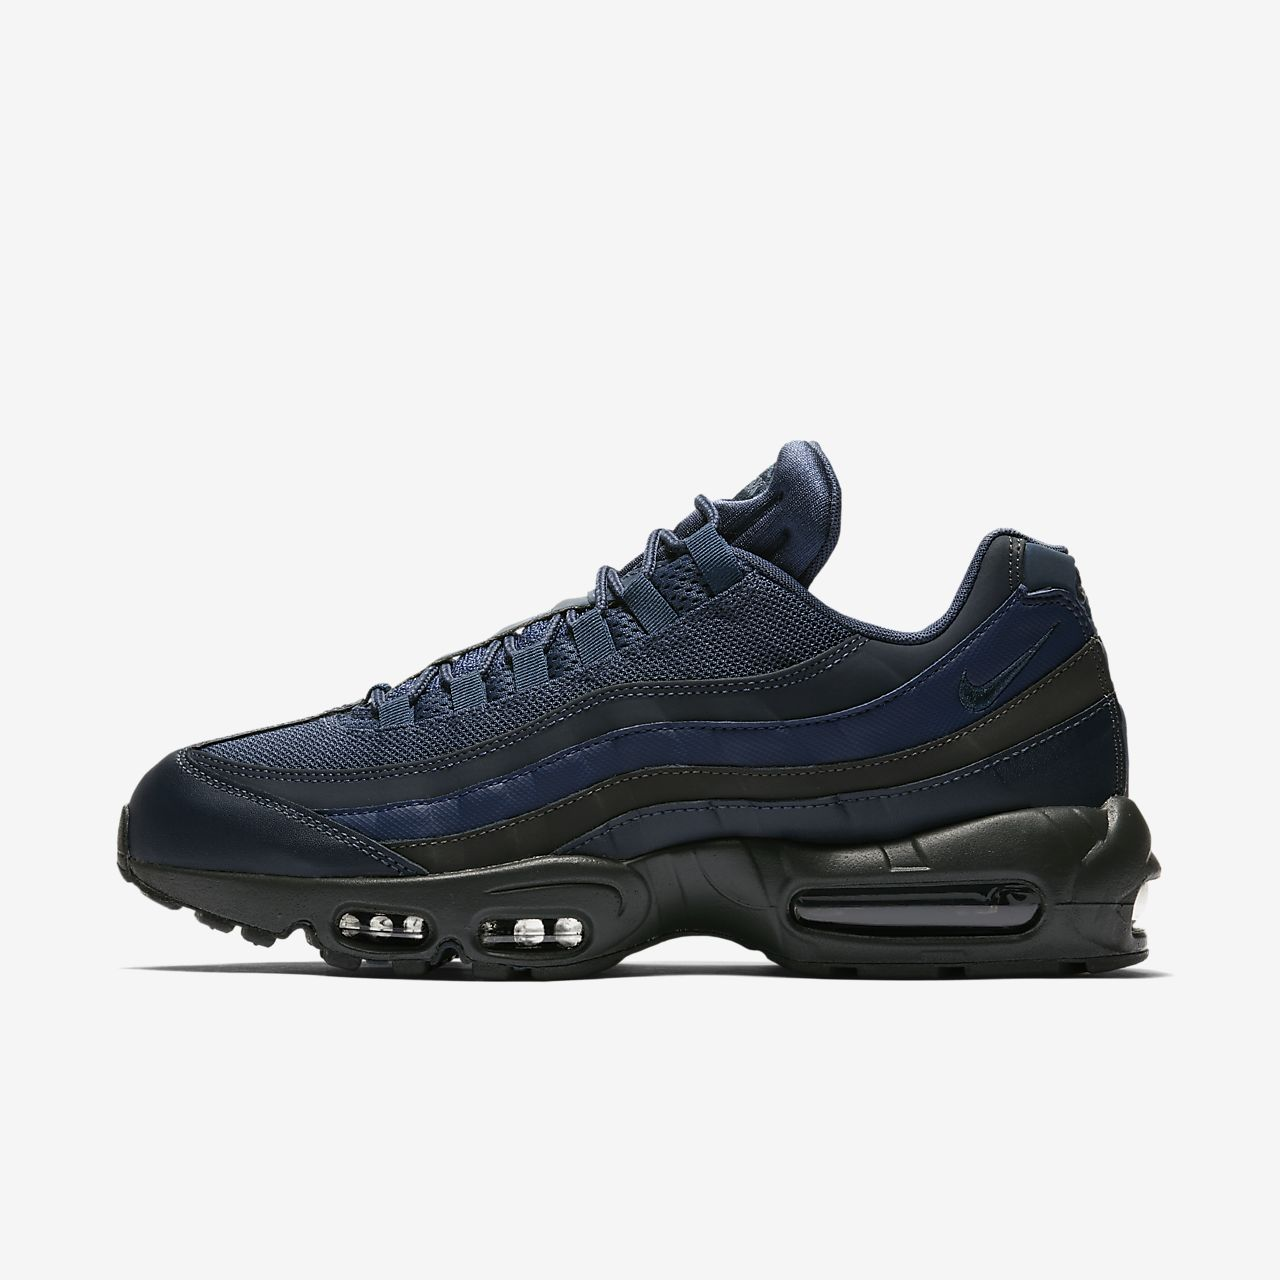 in stock 04232 ac936 ... Nike Air Max 95 Essential-sko til mænd